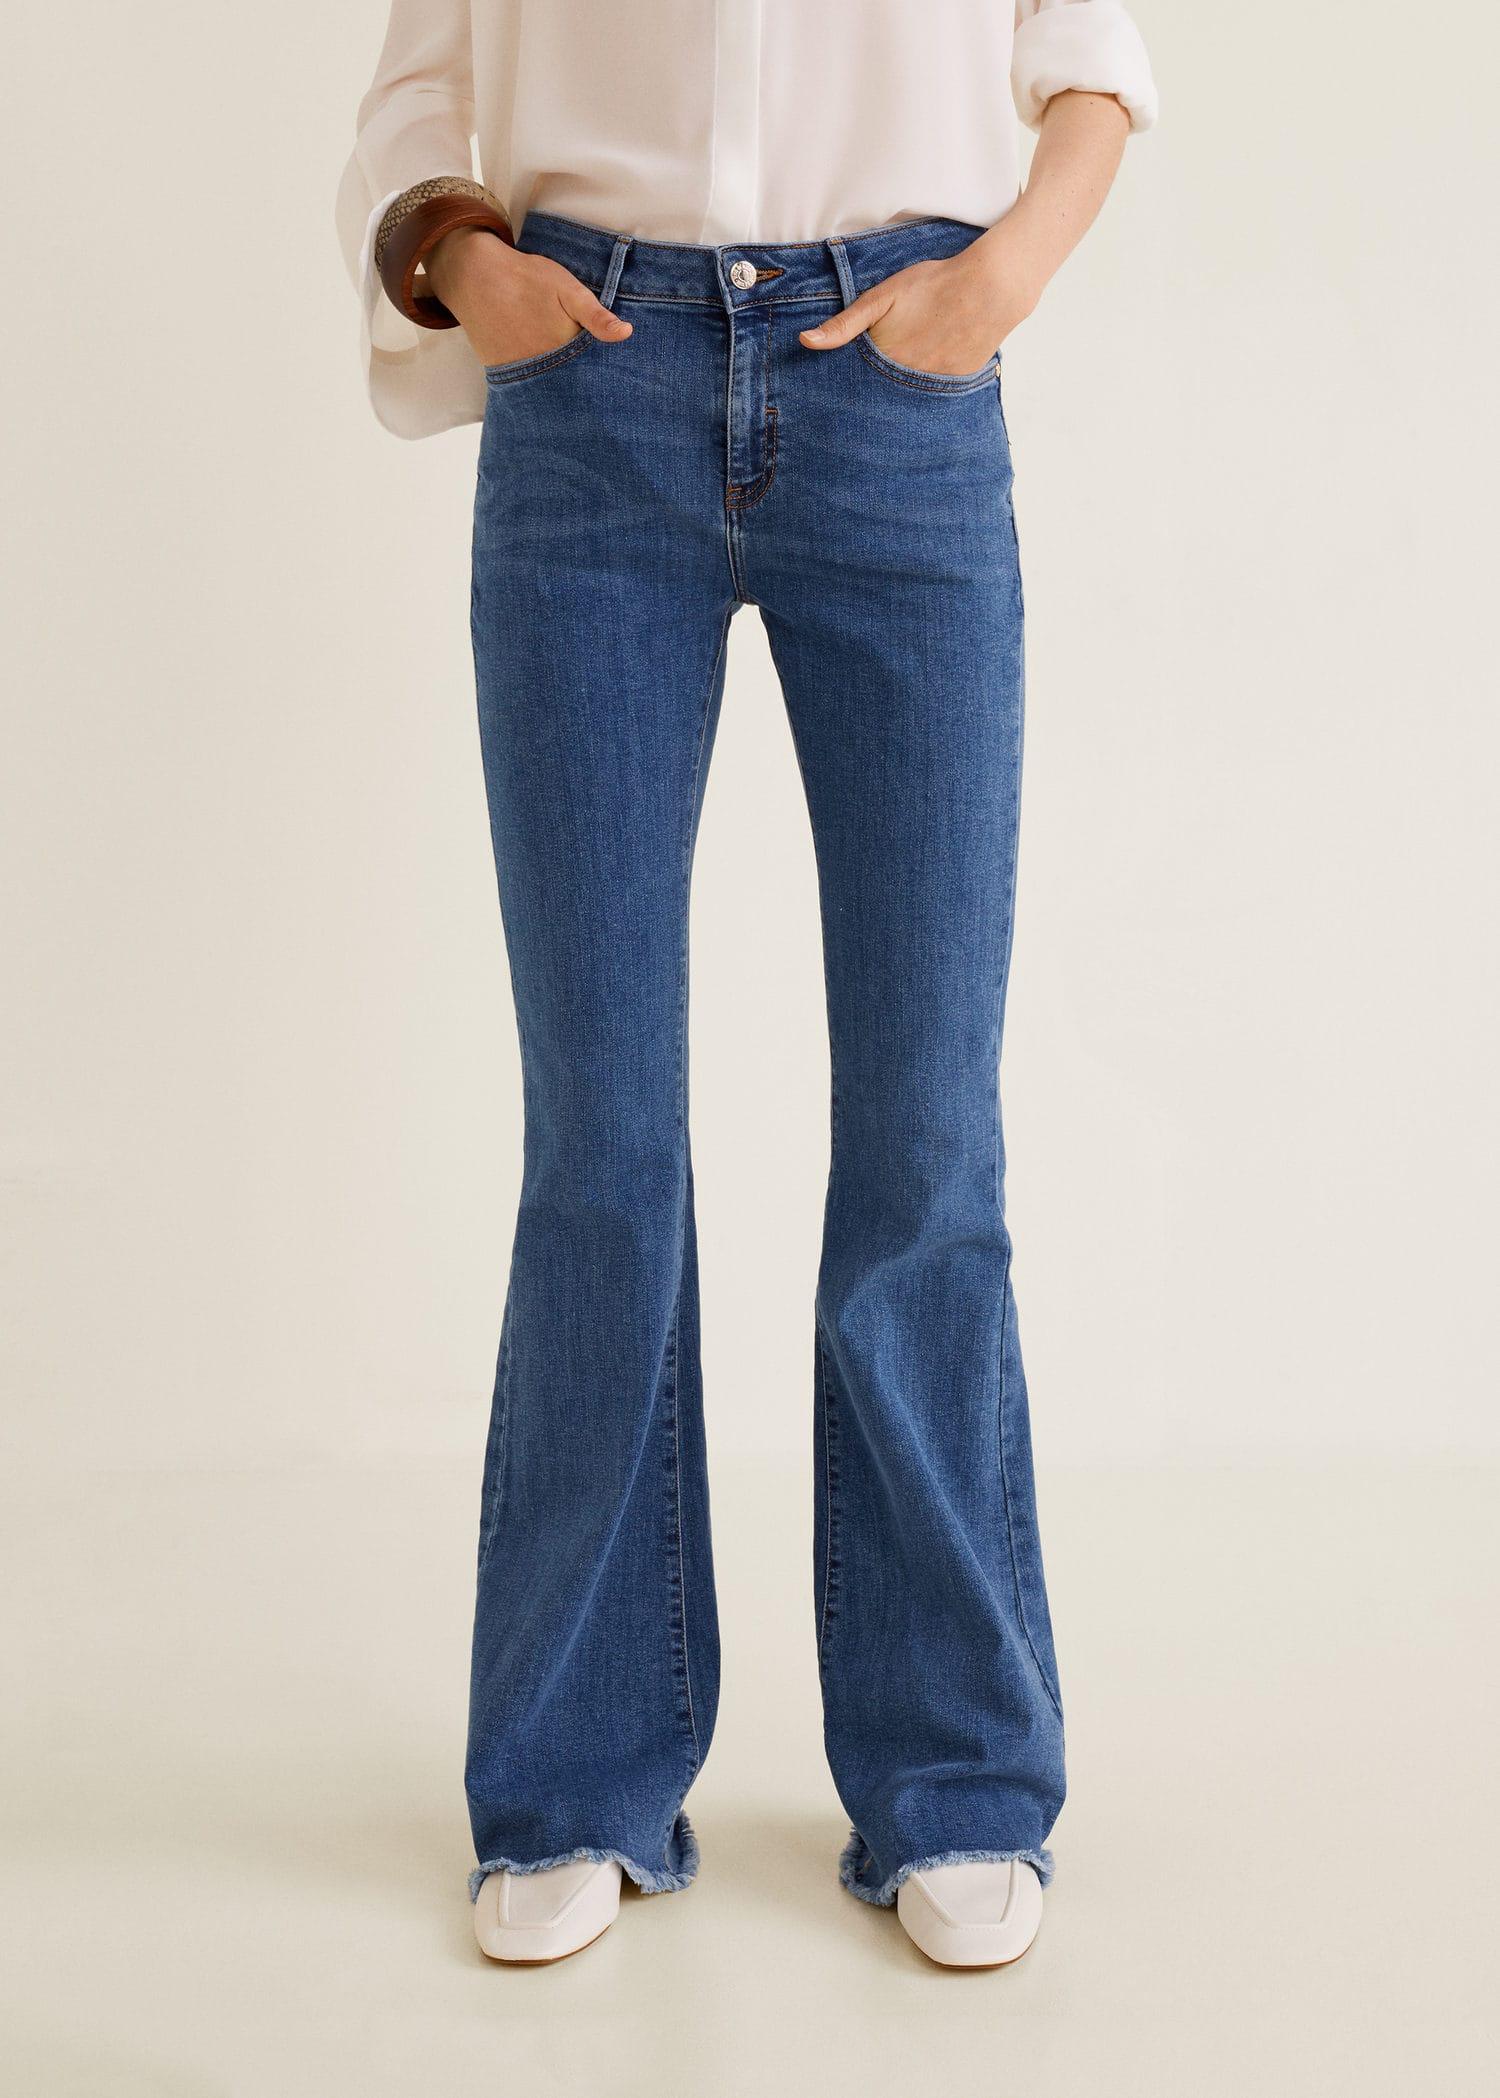 Jeans i mellanblå denim| XLNT Dam | KappAhl